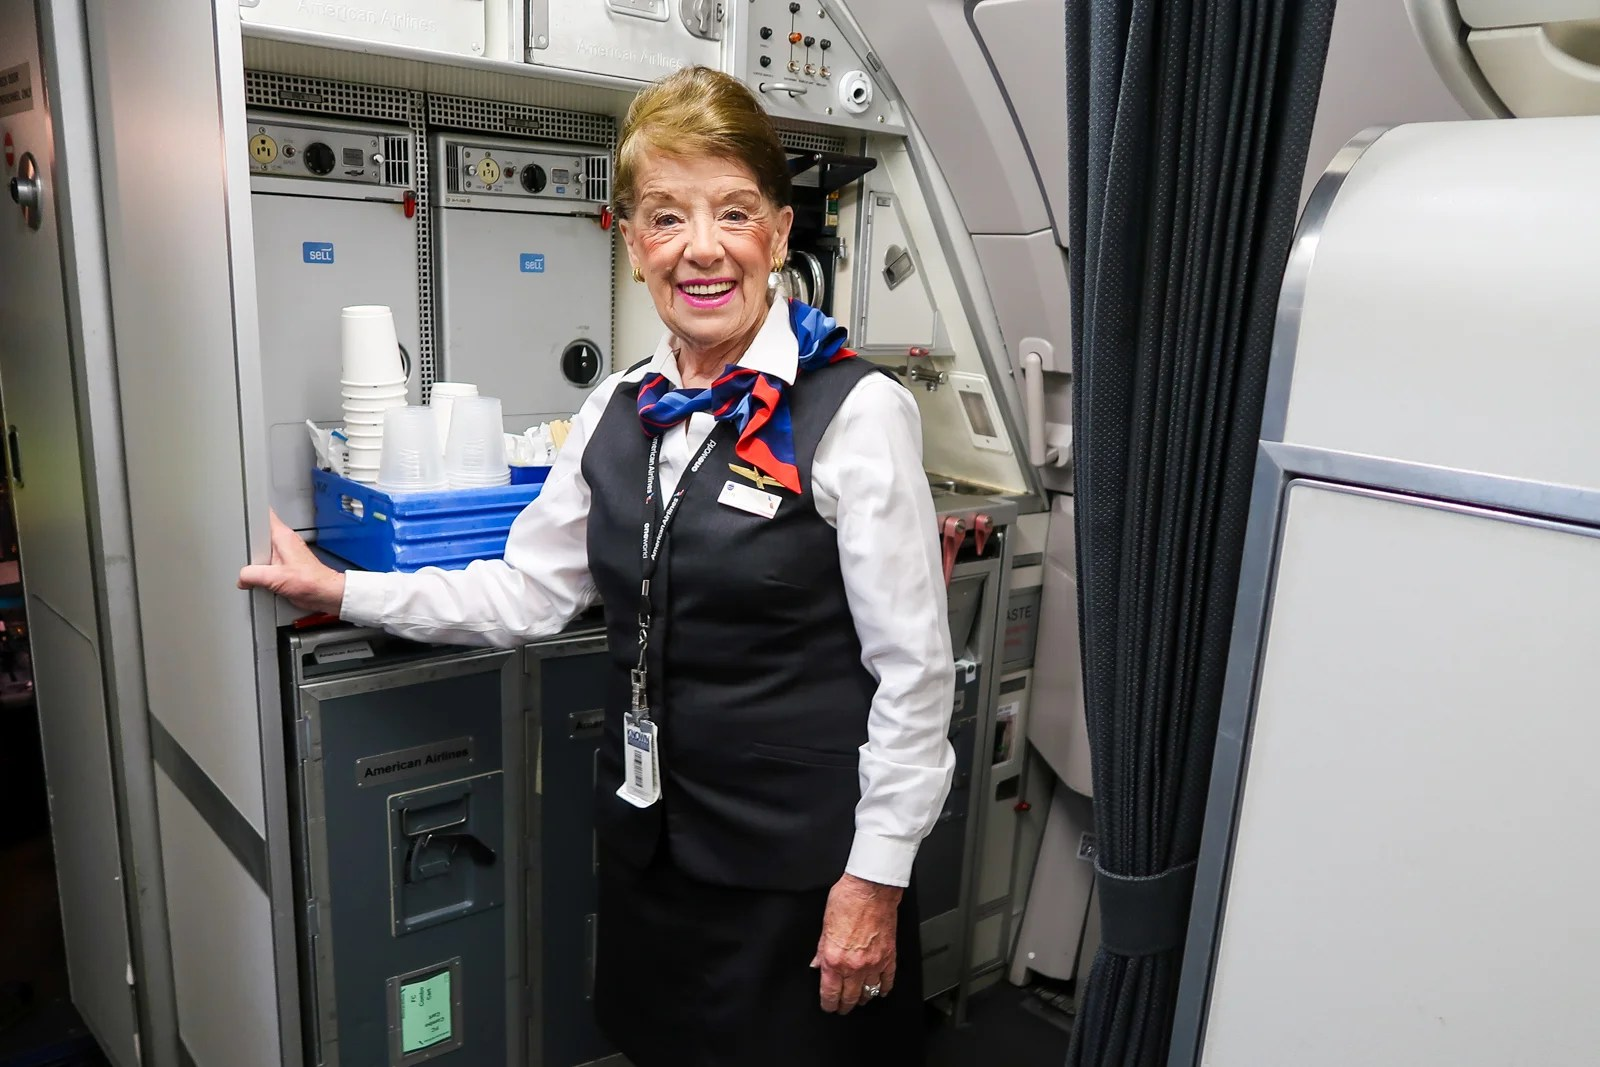 Not airplane flight attendantsnew